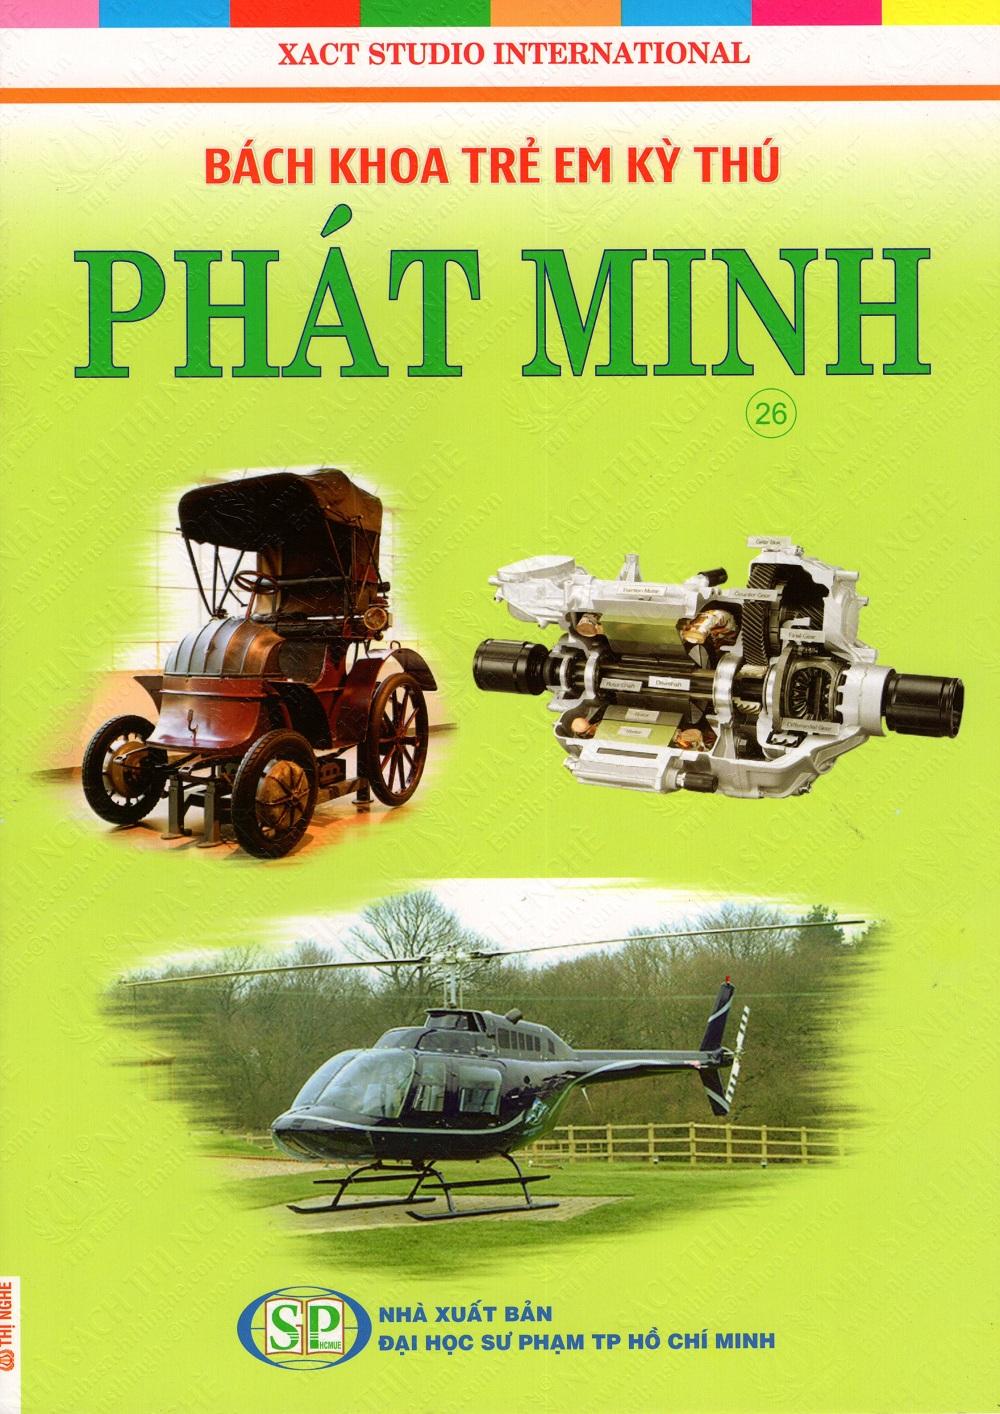 Bìa sách Bách Khoa Trẻ Em Kỳ Thú - Phát Minh (26)